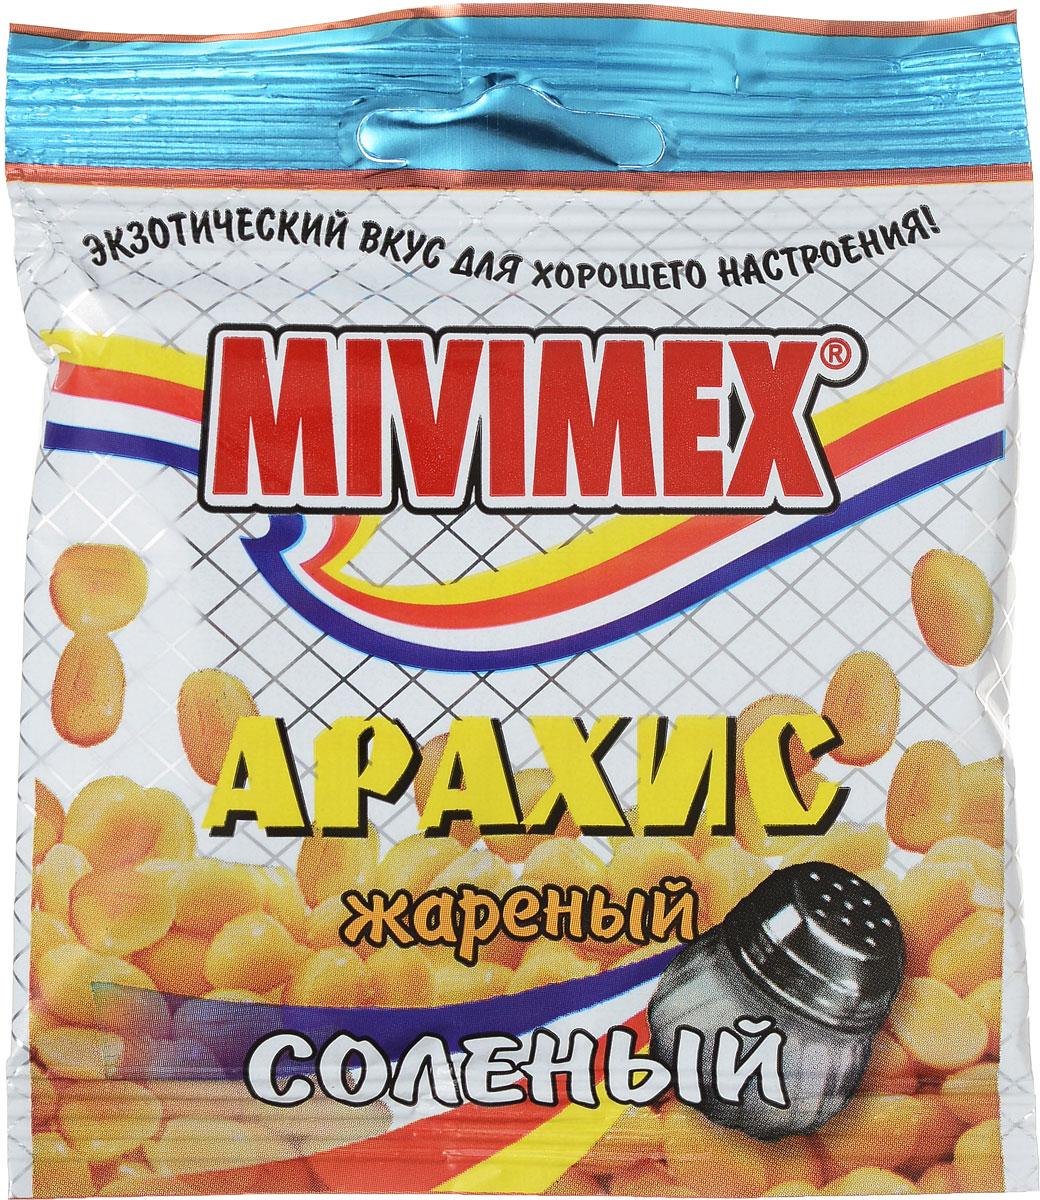 Mivimex Арахис жареный соленый, 25 г